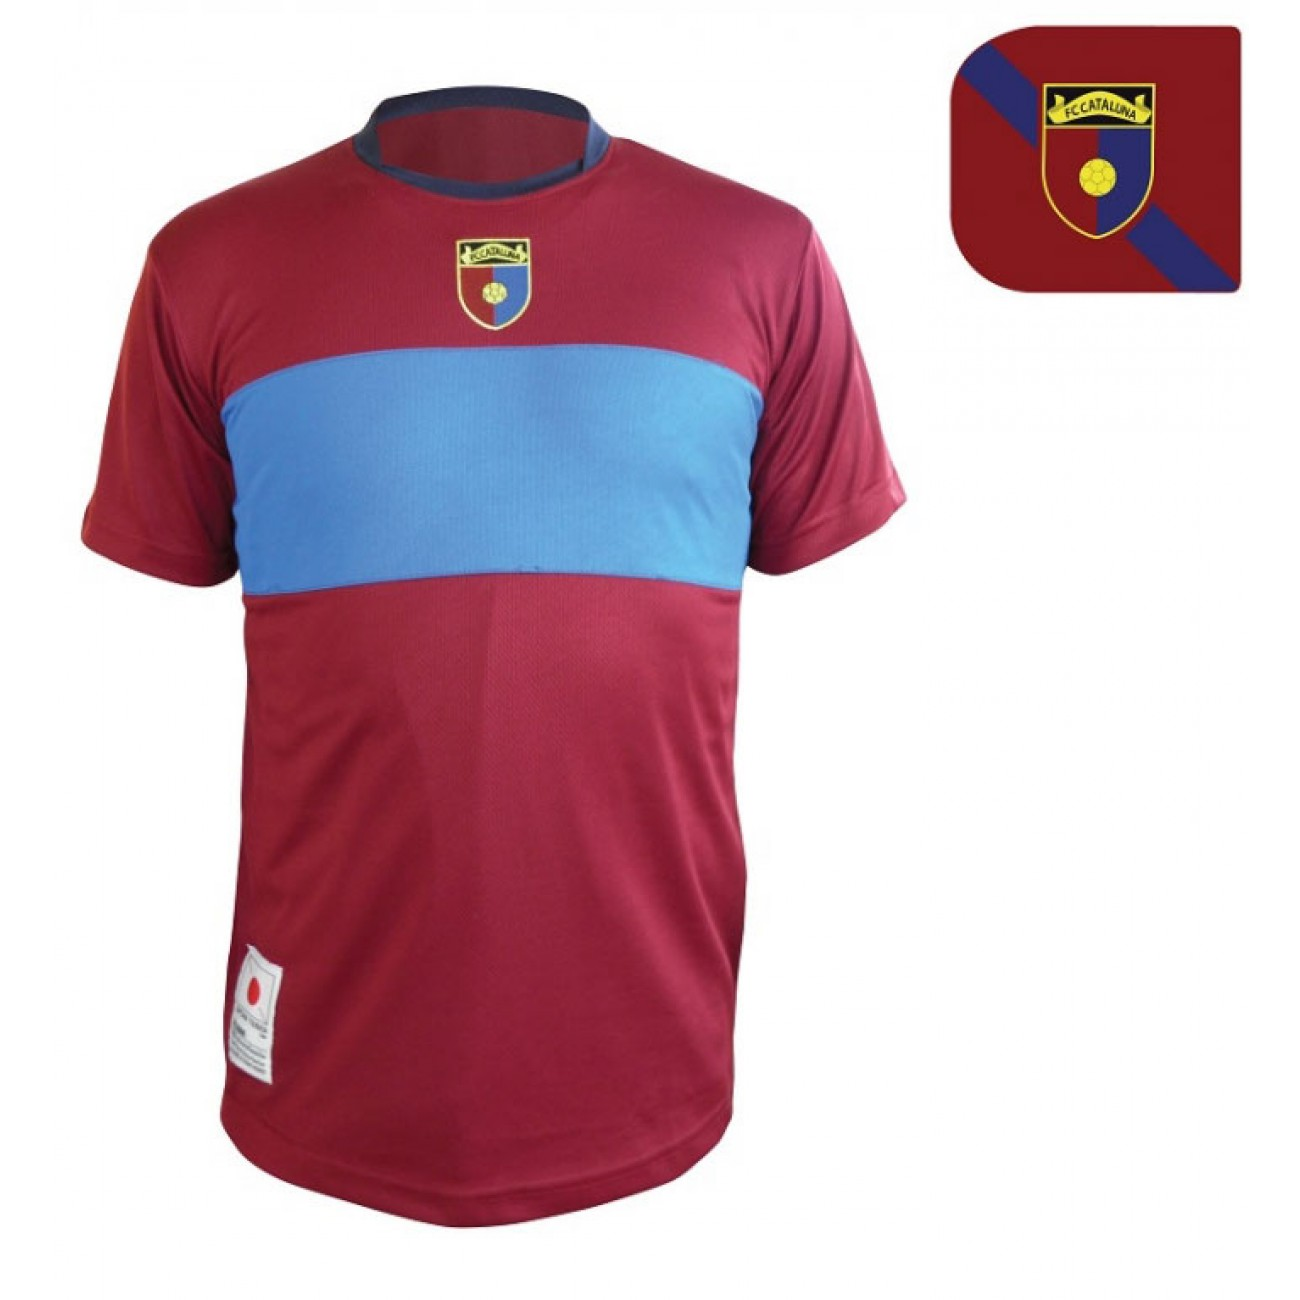 http://www.retrofootball.es/ropa-de-futbol/camiseta-oliver-atom-catalunya.html